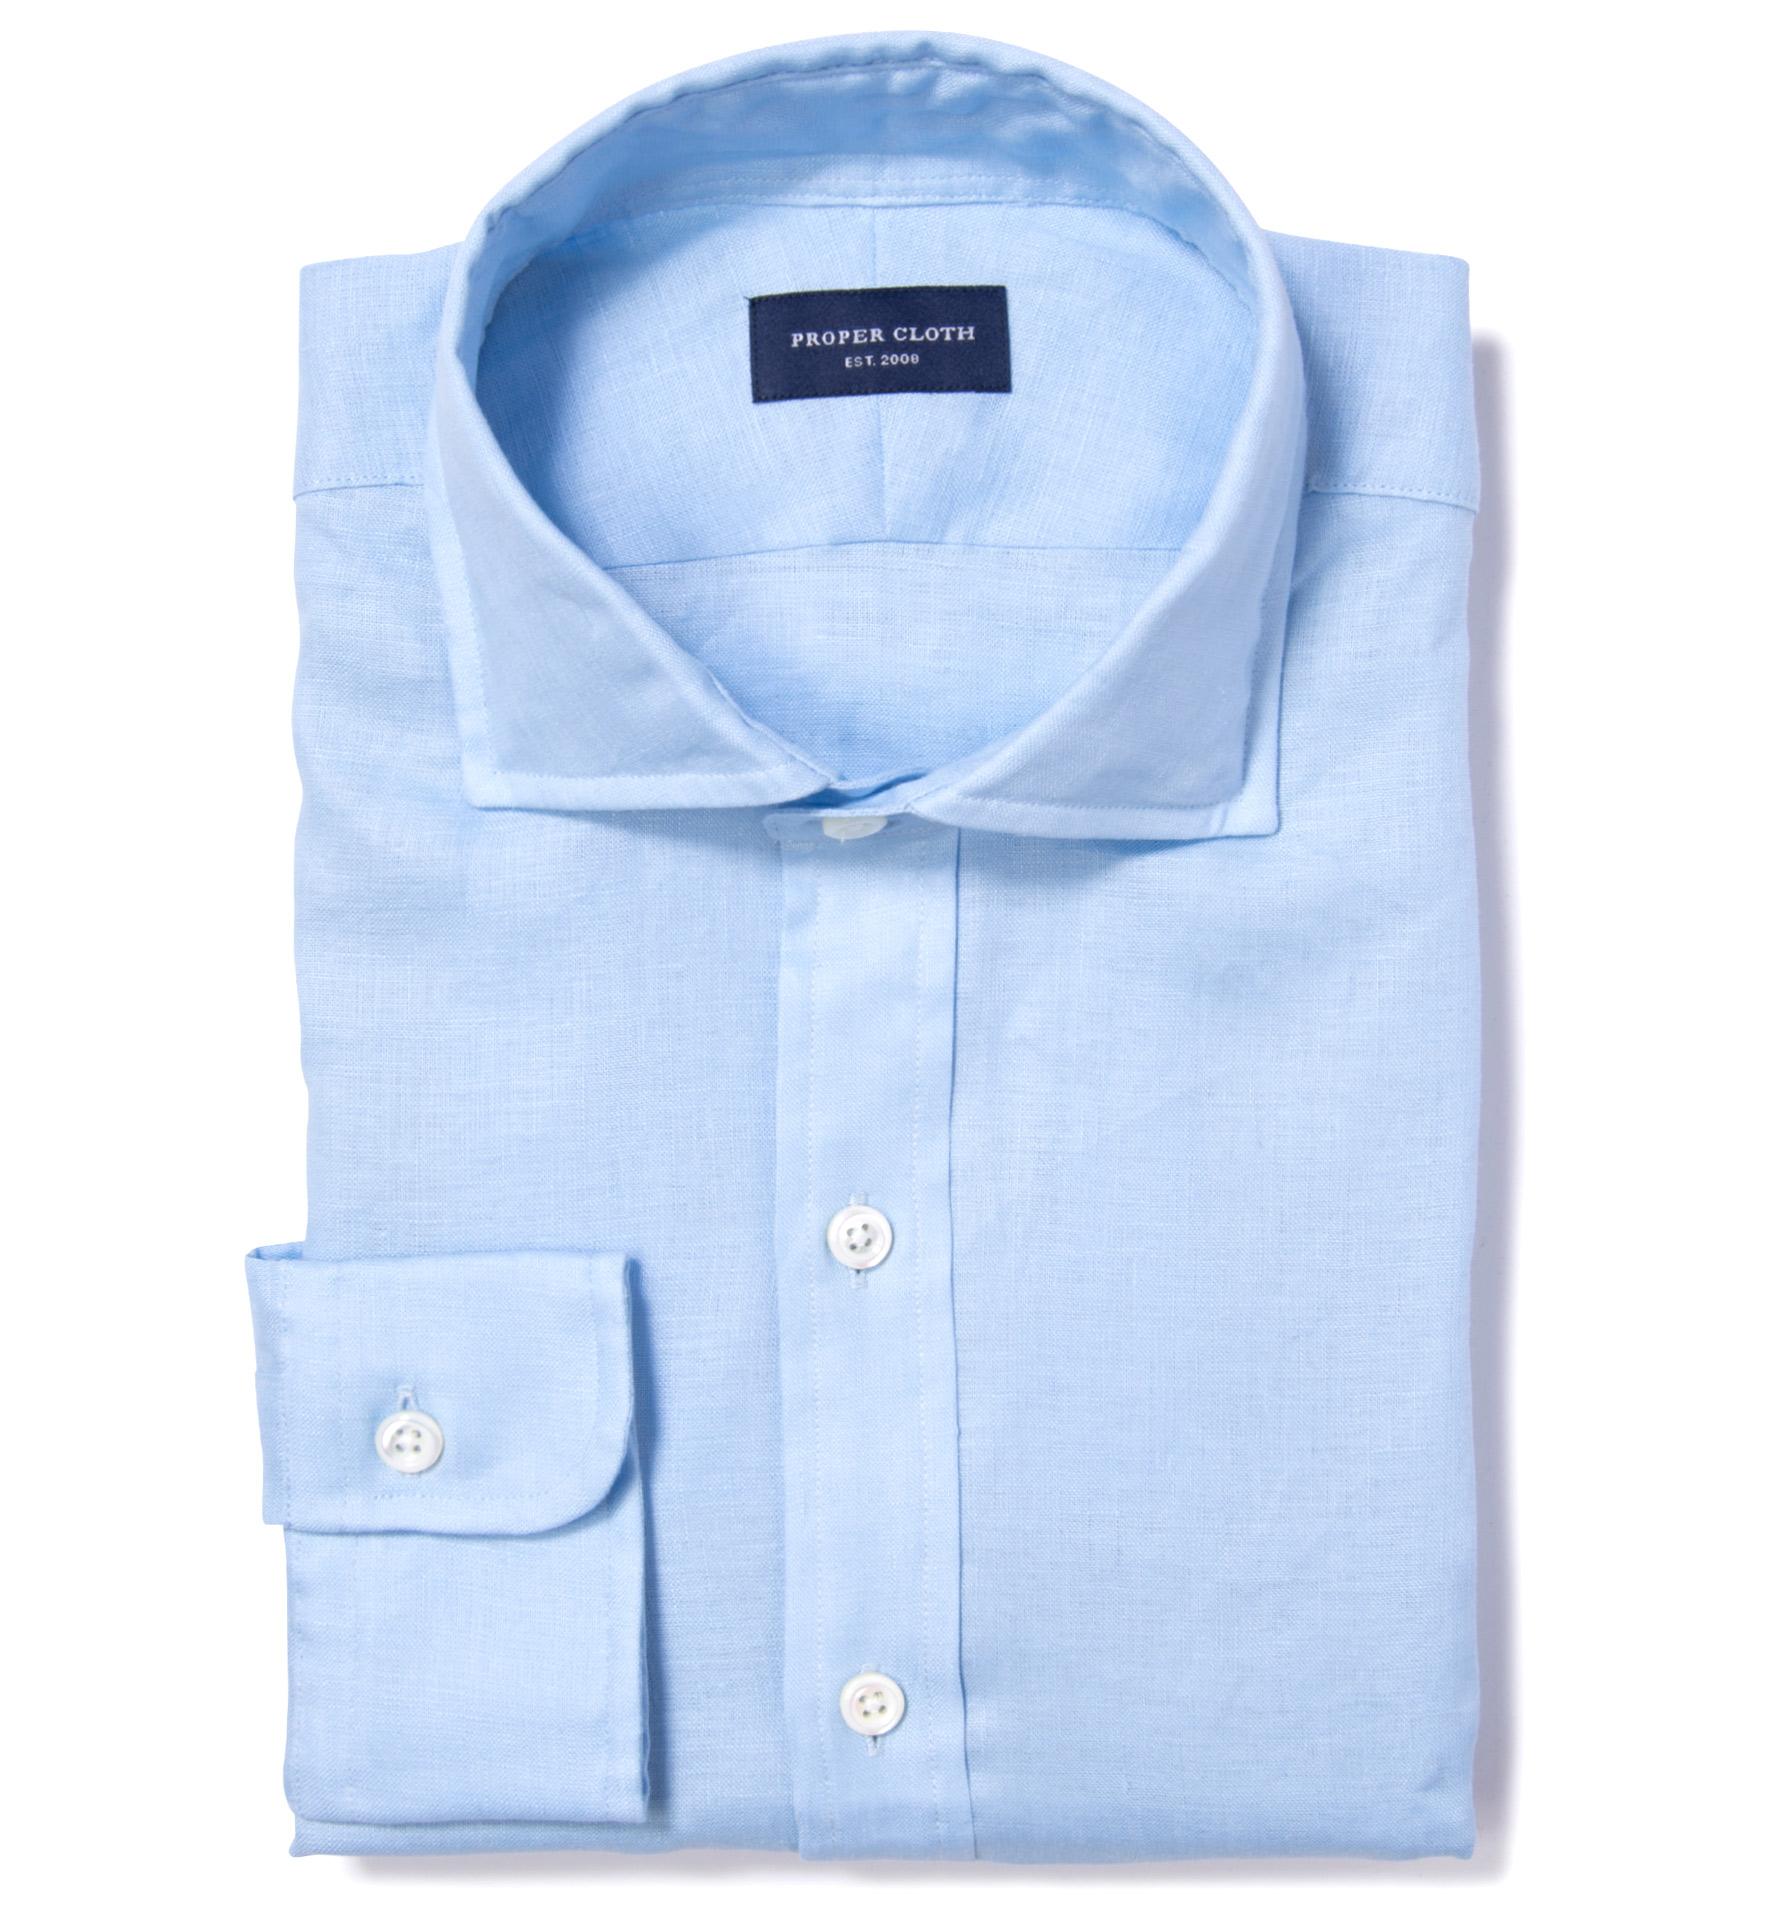 894ac0c78ff Canclini Light Blue Linen Fitted Dress Shirt by Proper Cloth